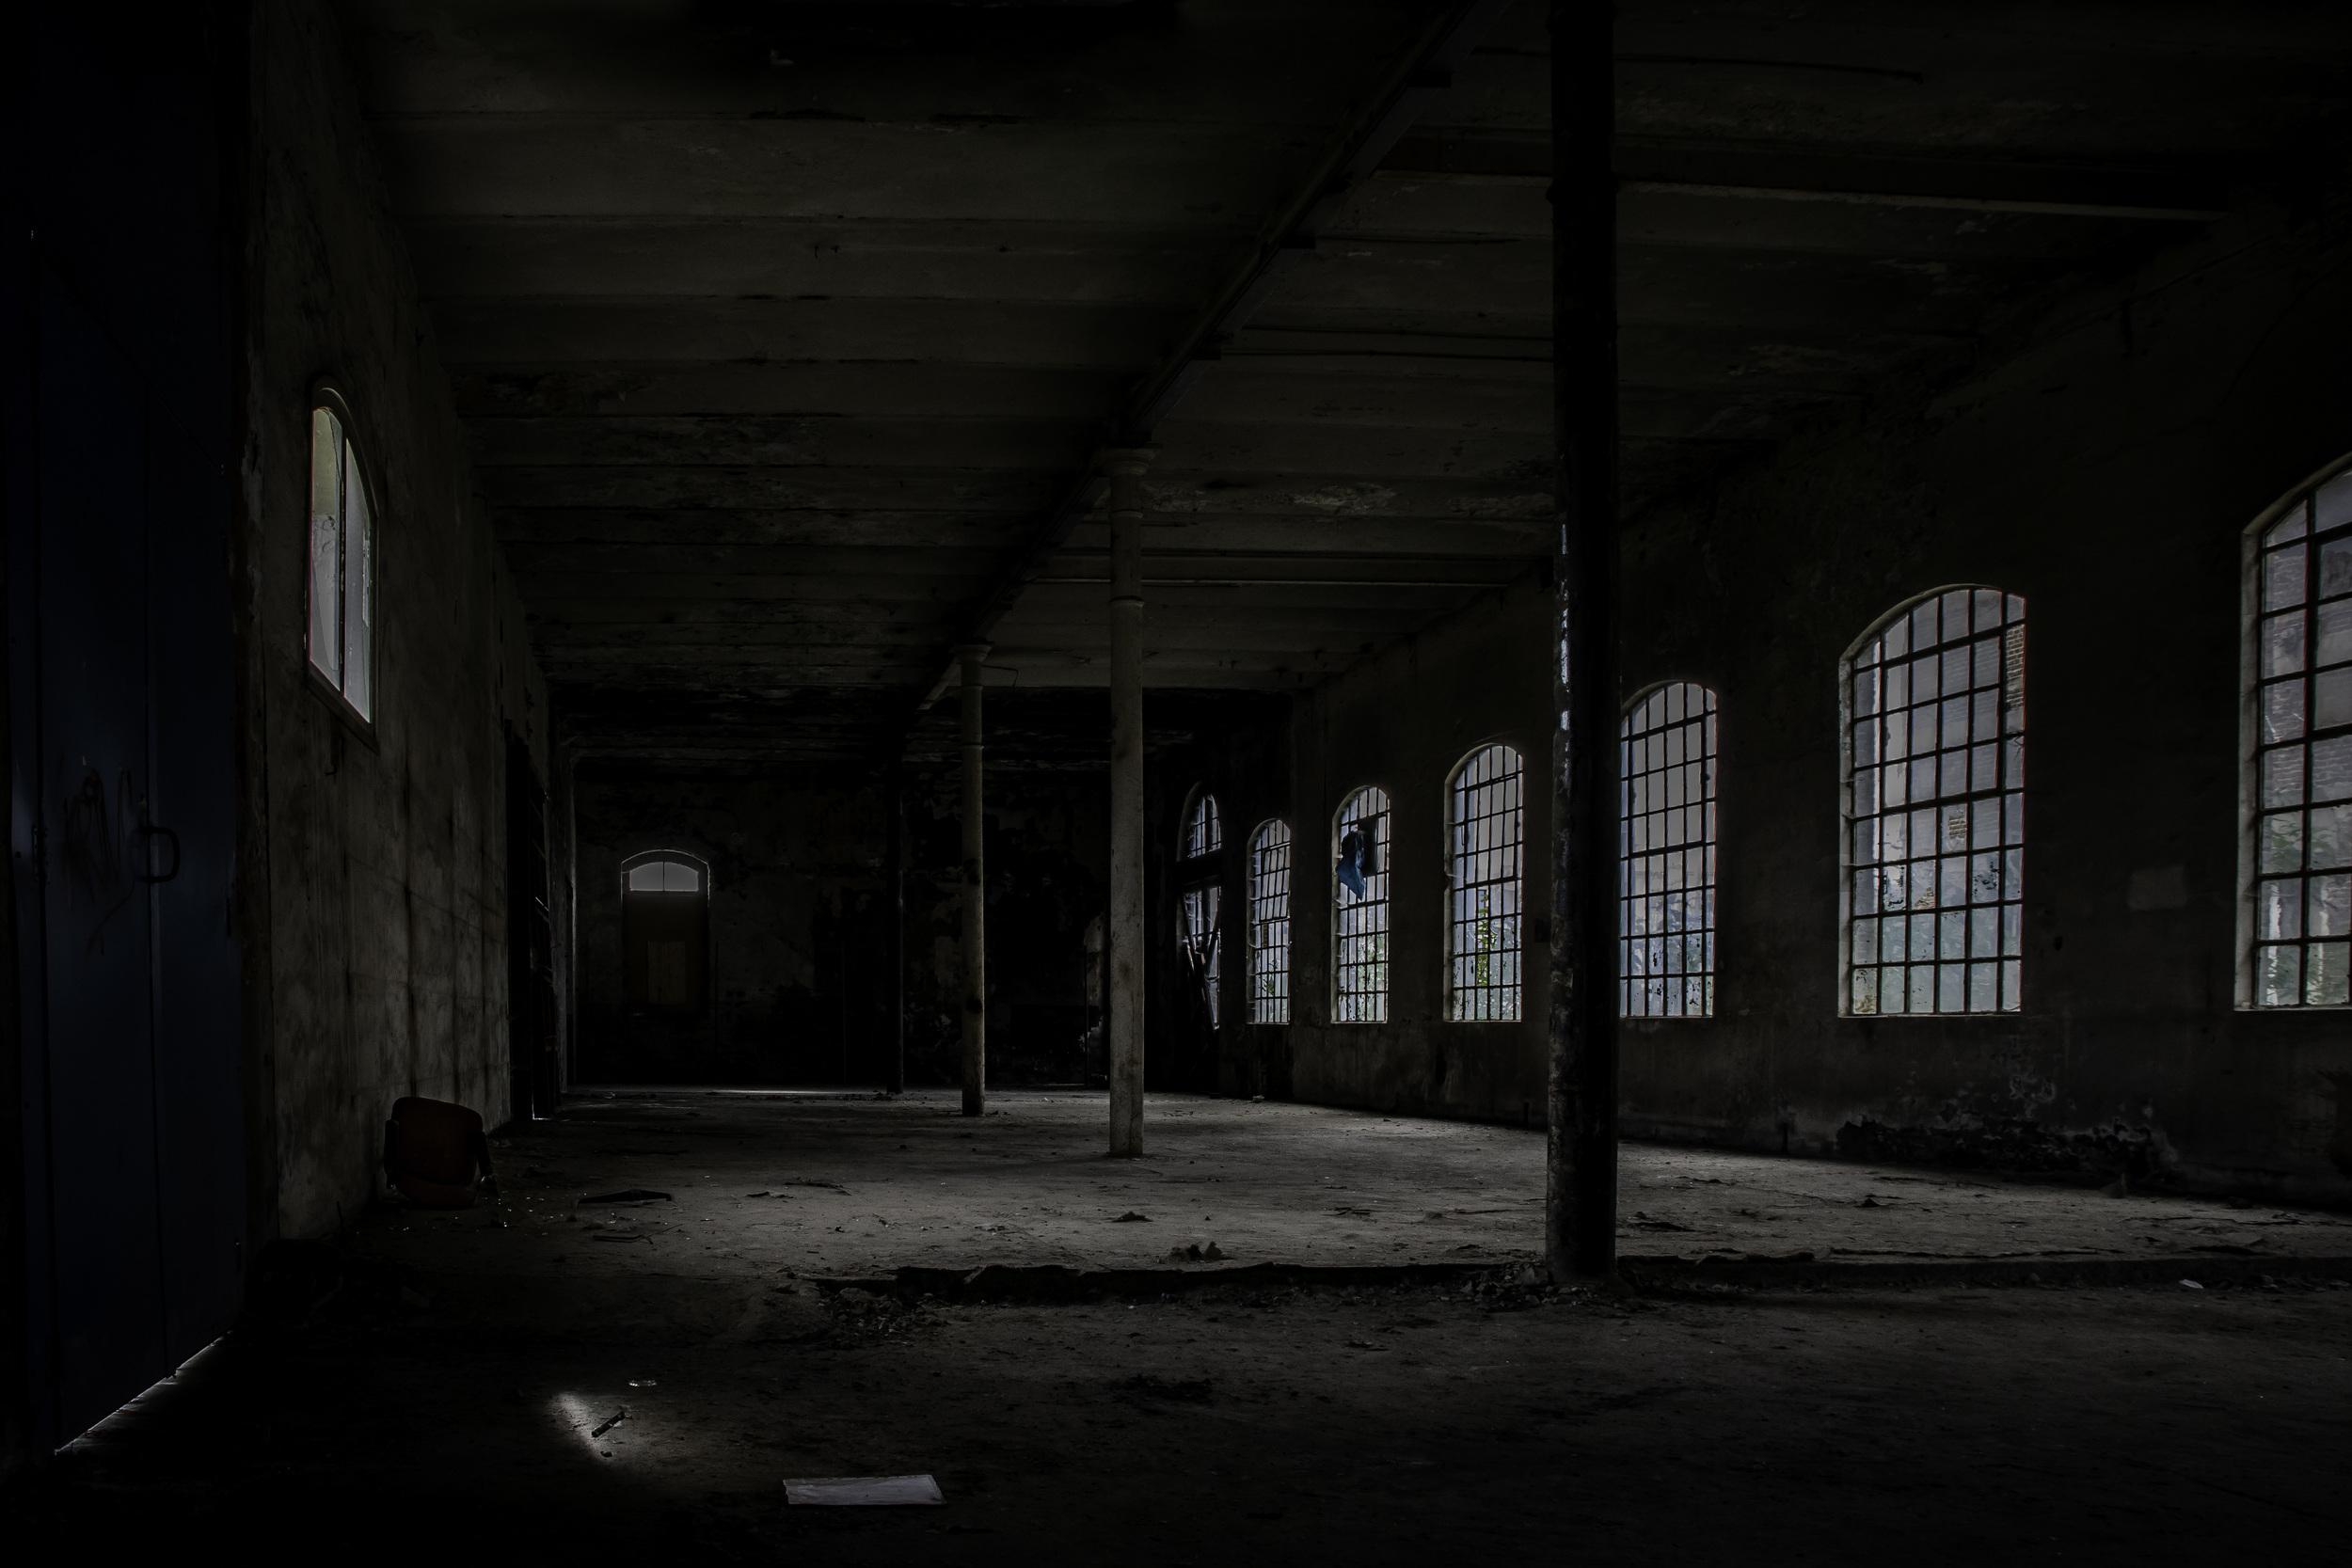 viewfinder-eigenzinnigie-fotografie-urbex-vergane-glorie-oude-papierfabriek-opslagplaats